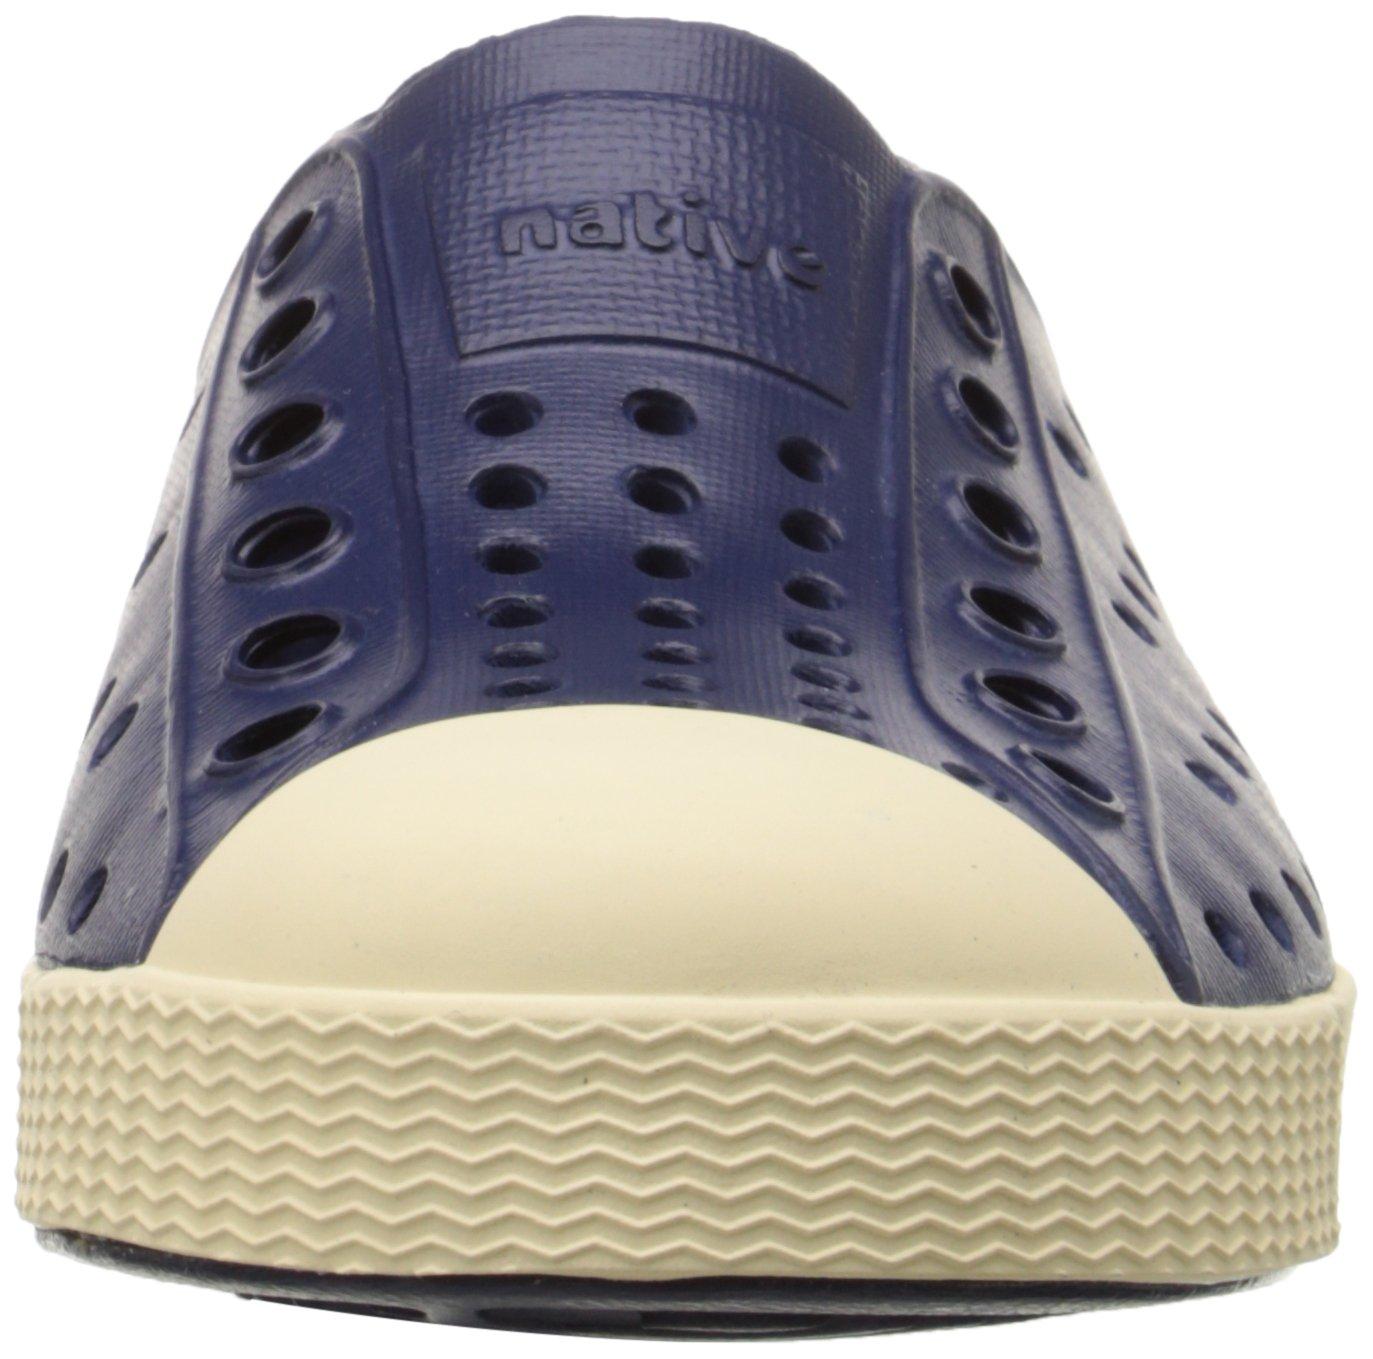 Native Jefferson Slip-On Sneaker,Regatta Blue,10 M US Toddler by Native Shoes (Image #4)